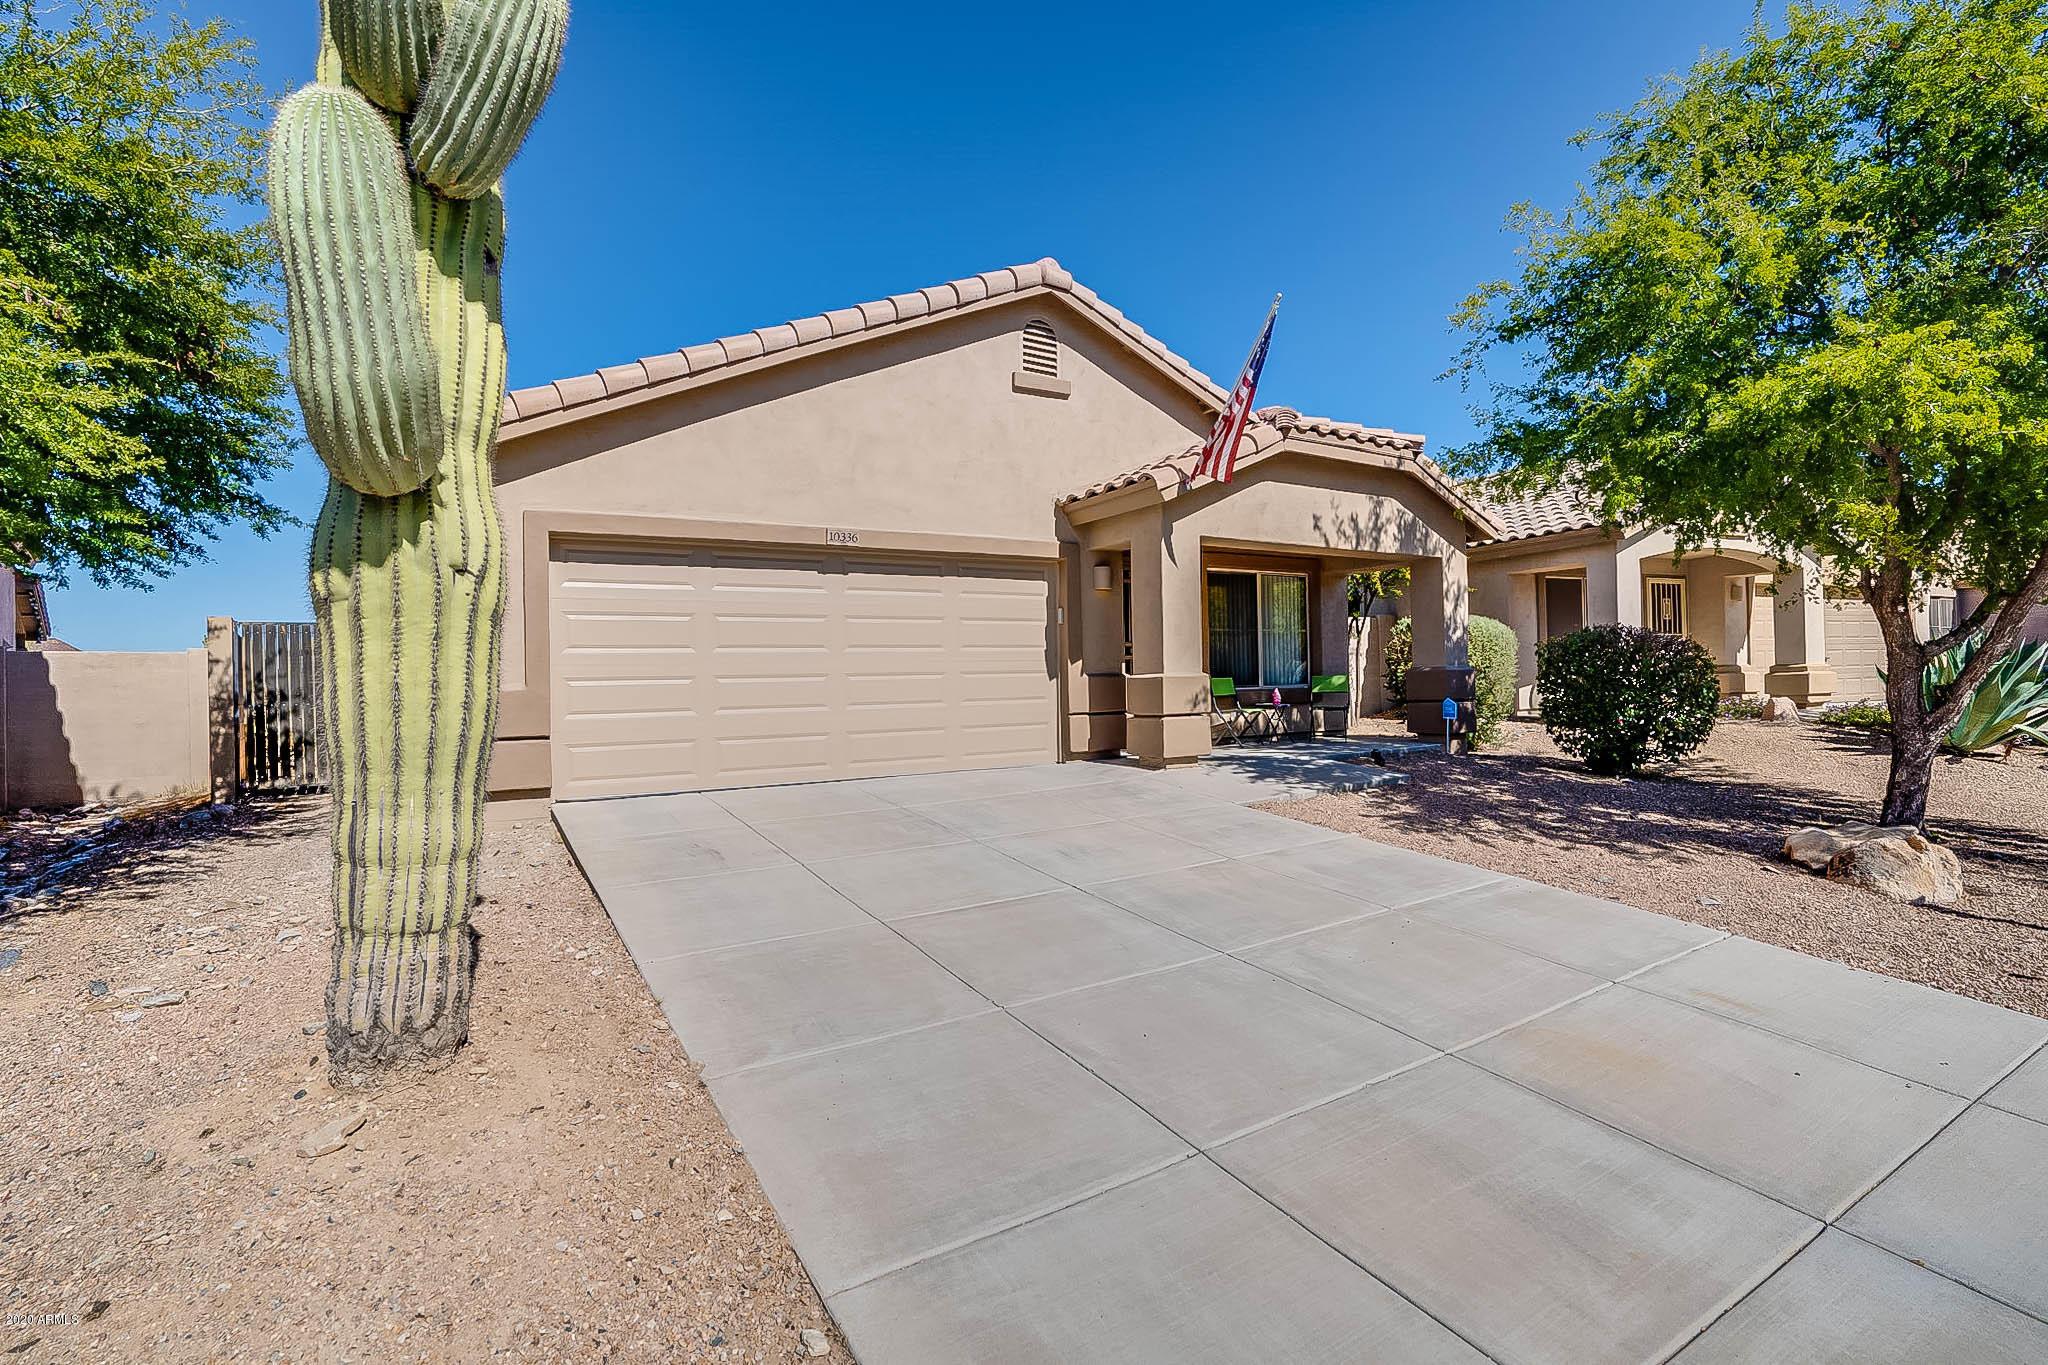 Photo of 10336 E RAINTREE Drive, Scottsdale, AZ 85255